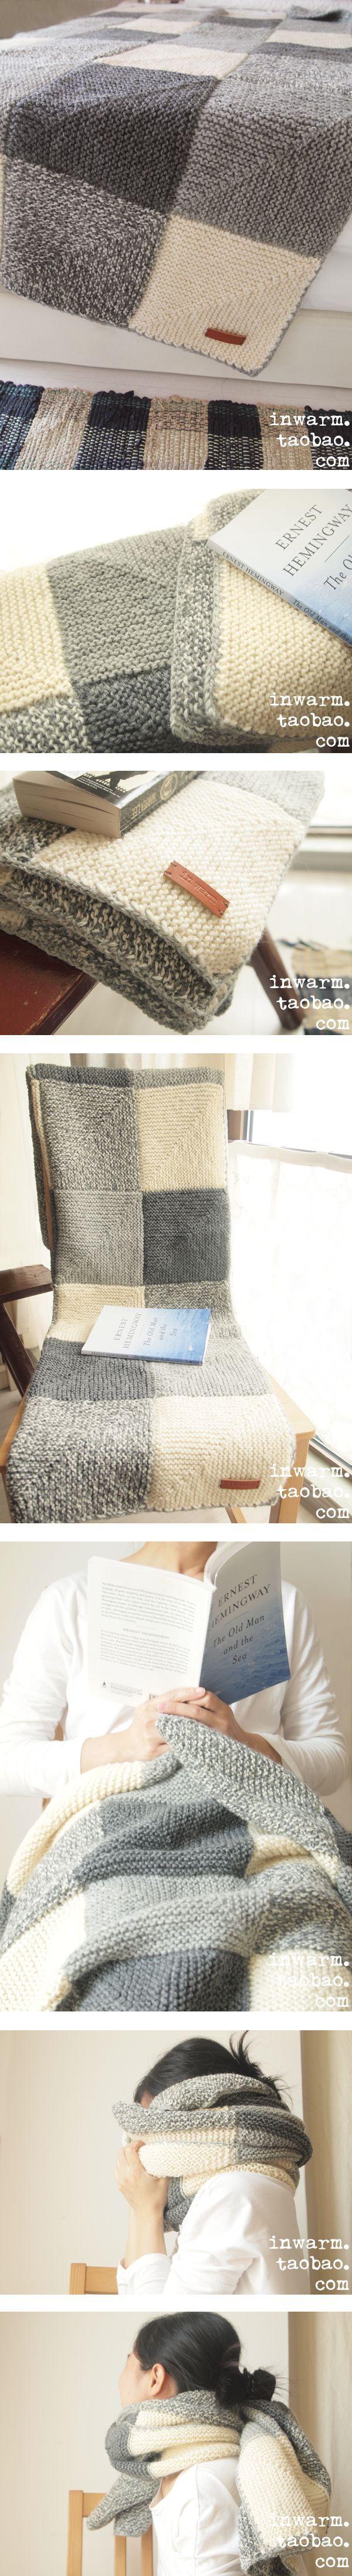 warm hand crochet blanket/hand crocheted blankets/crochet patterns blanket/crocheted doilies-inBlankets from Home & Garden on Aliexpress.com